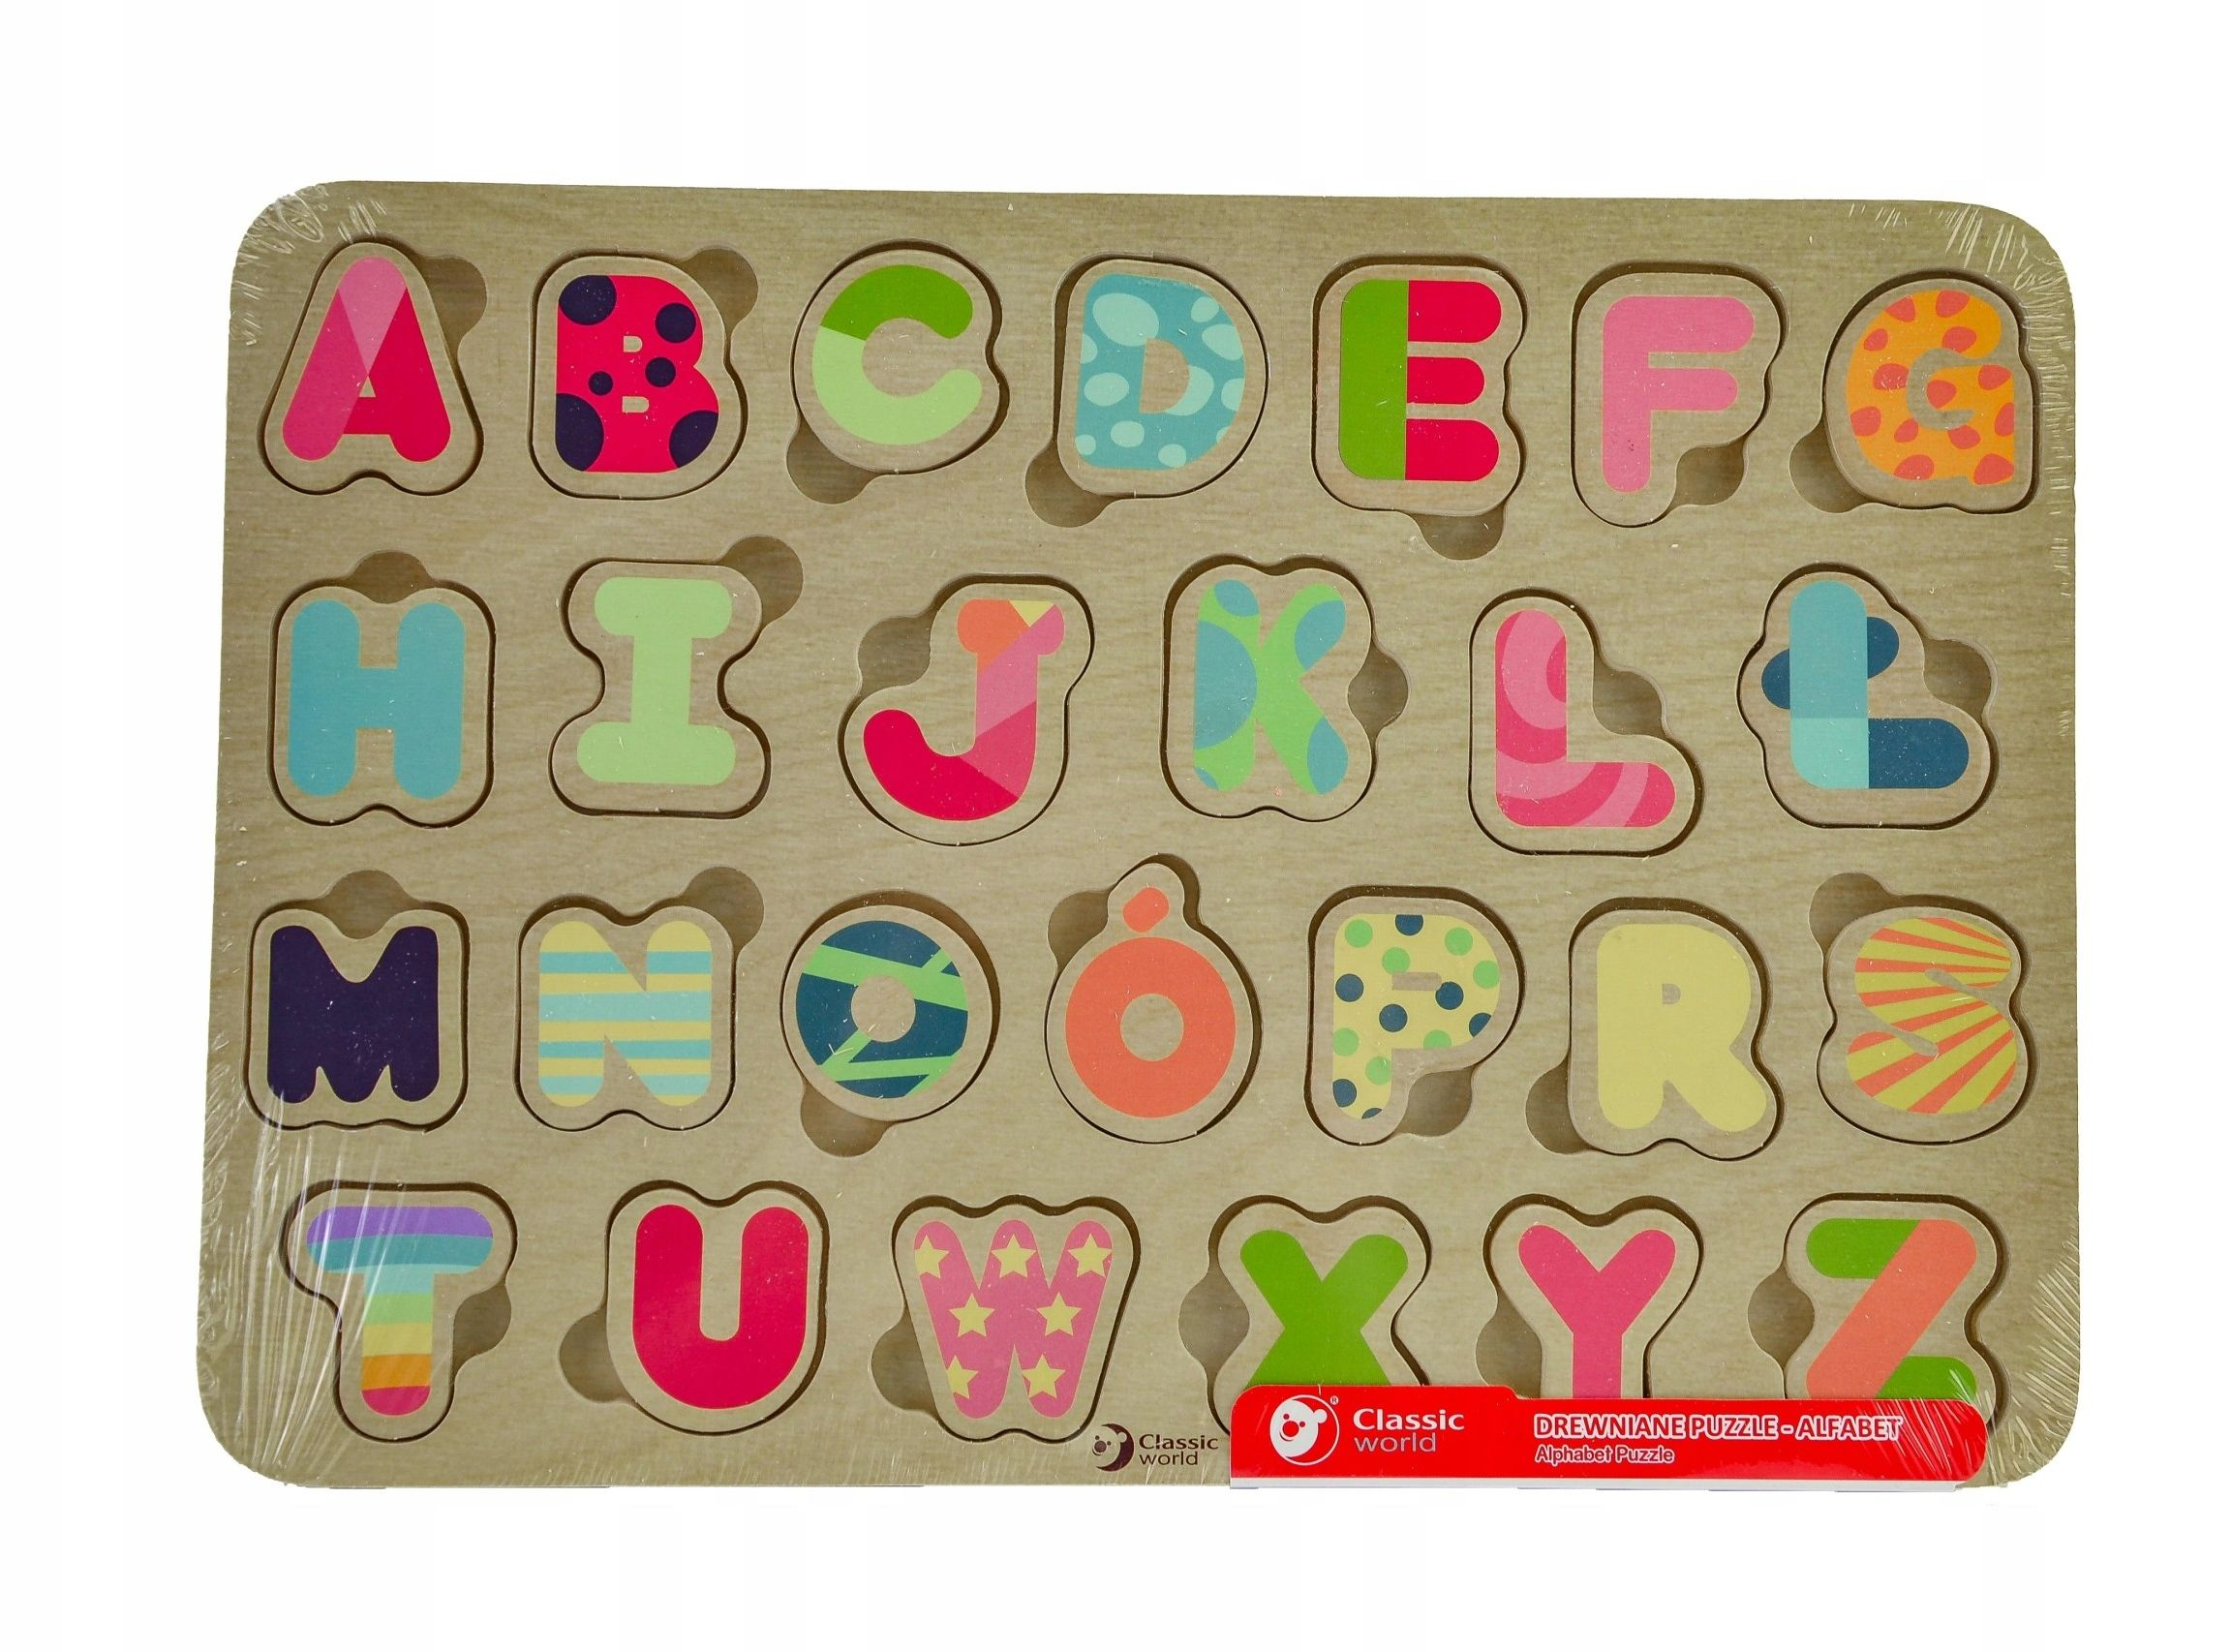 CLASSIC WORLD Układanka Puzzle Alfabet nauka Literek